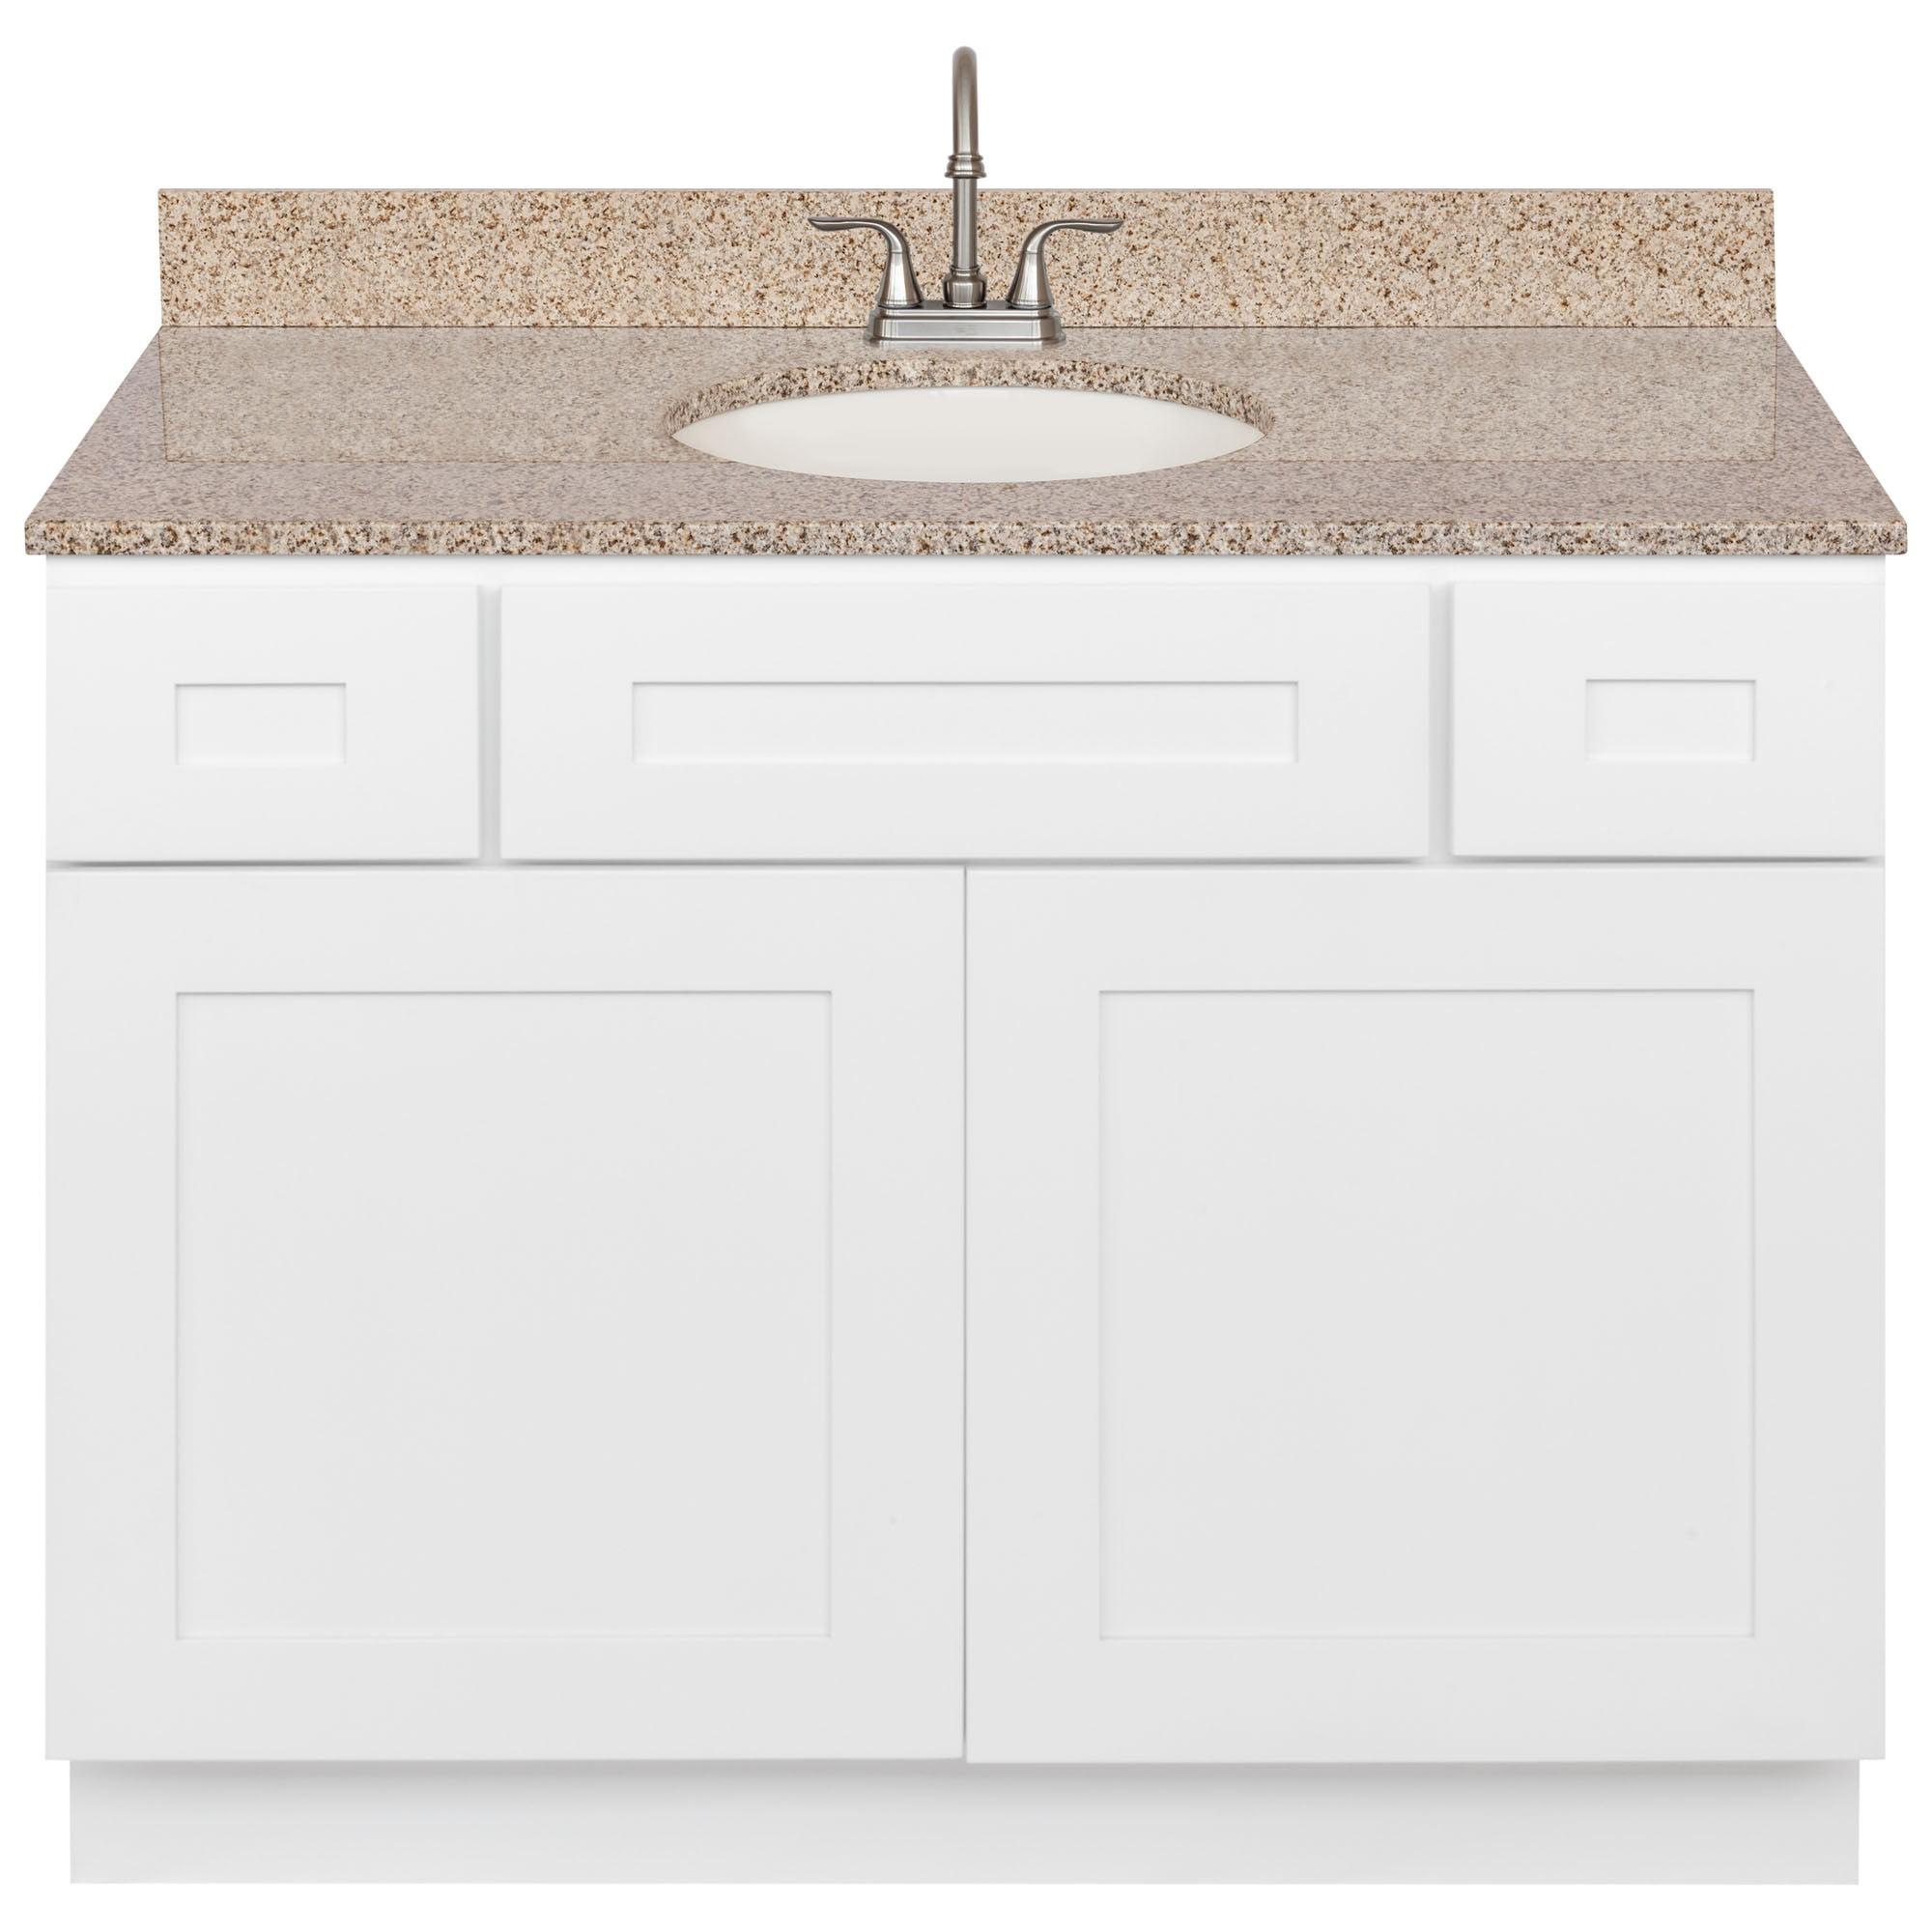 White Bathroom Vanity 42 Wheat Granite Top Faucet Lb6b Walmart Com Walmart Com